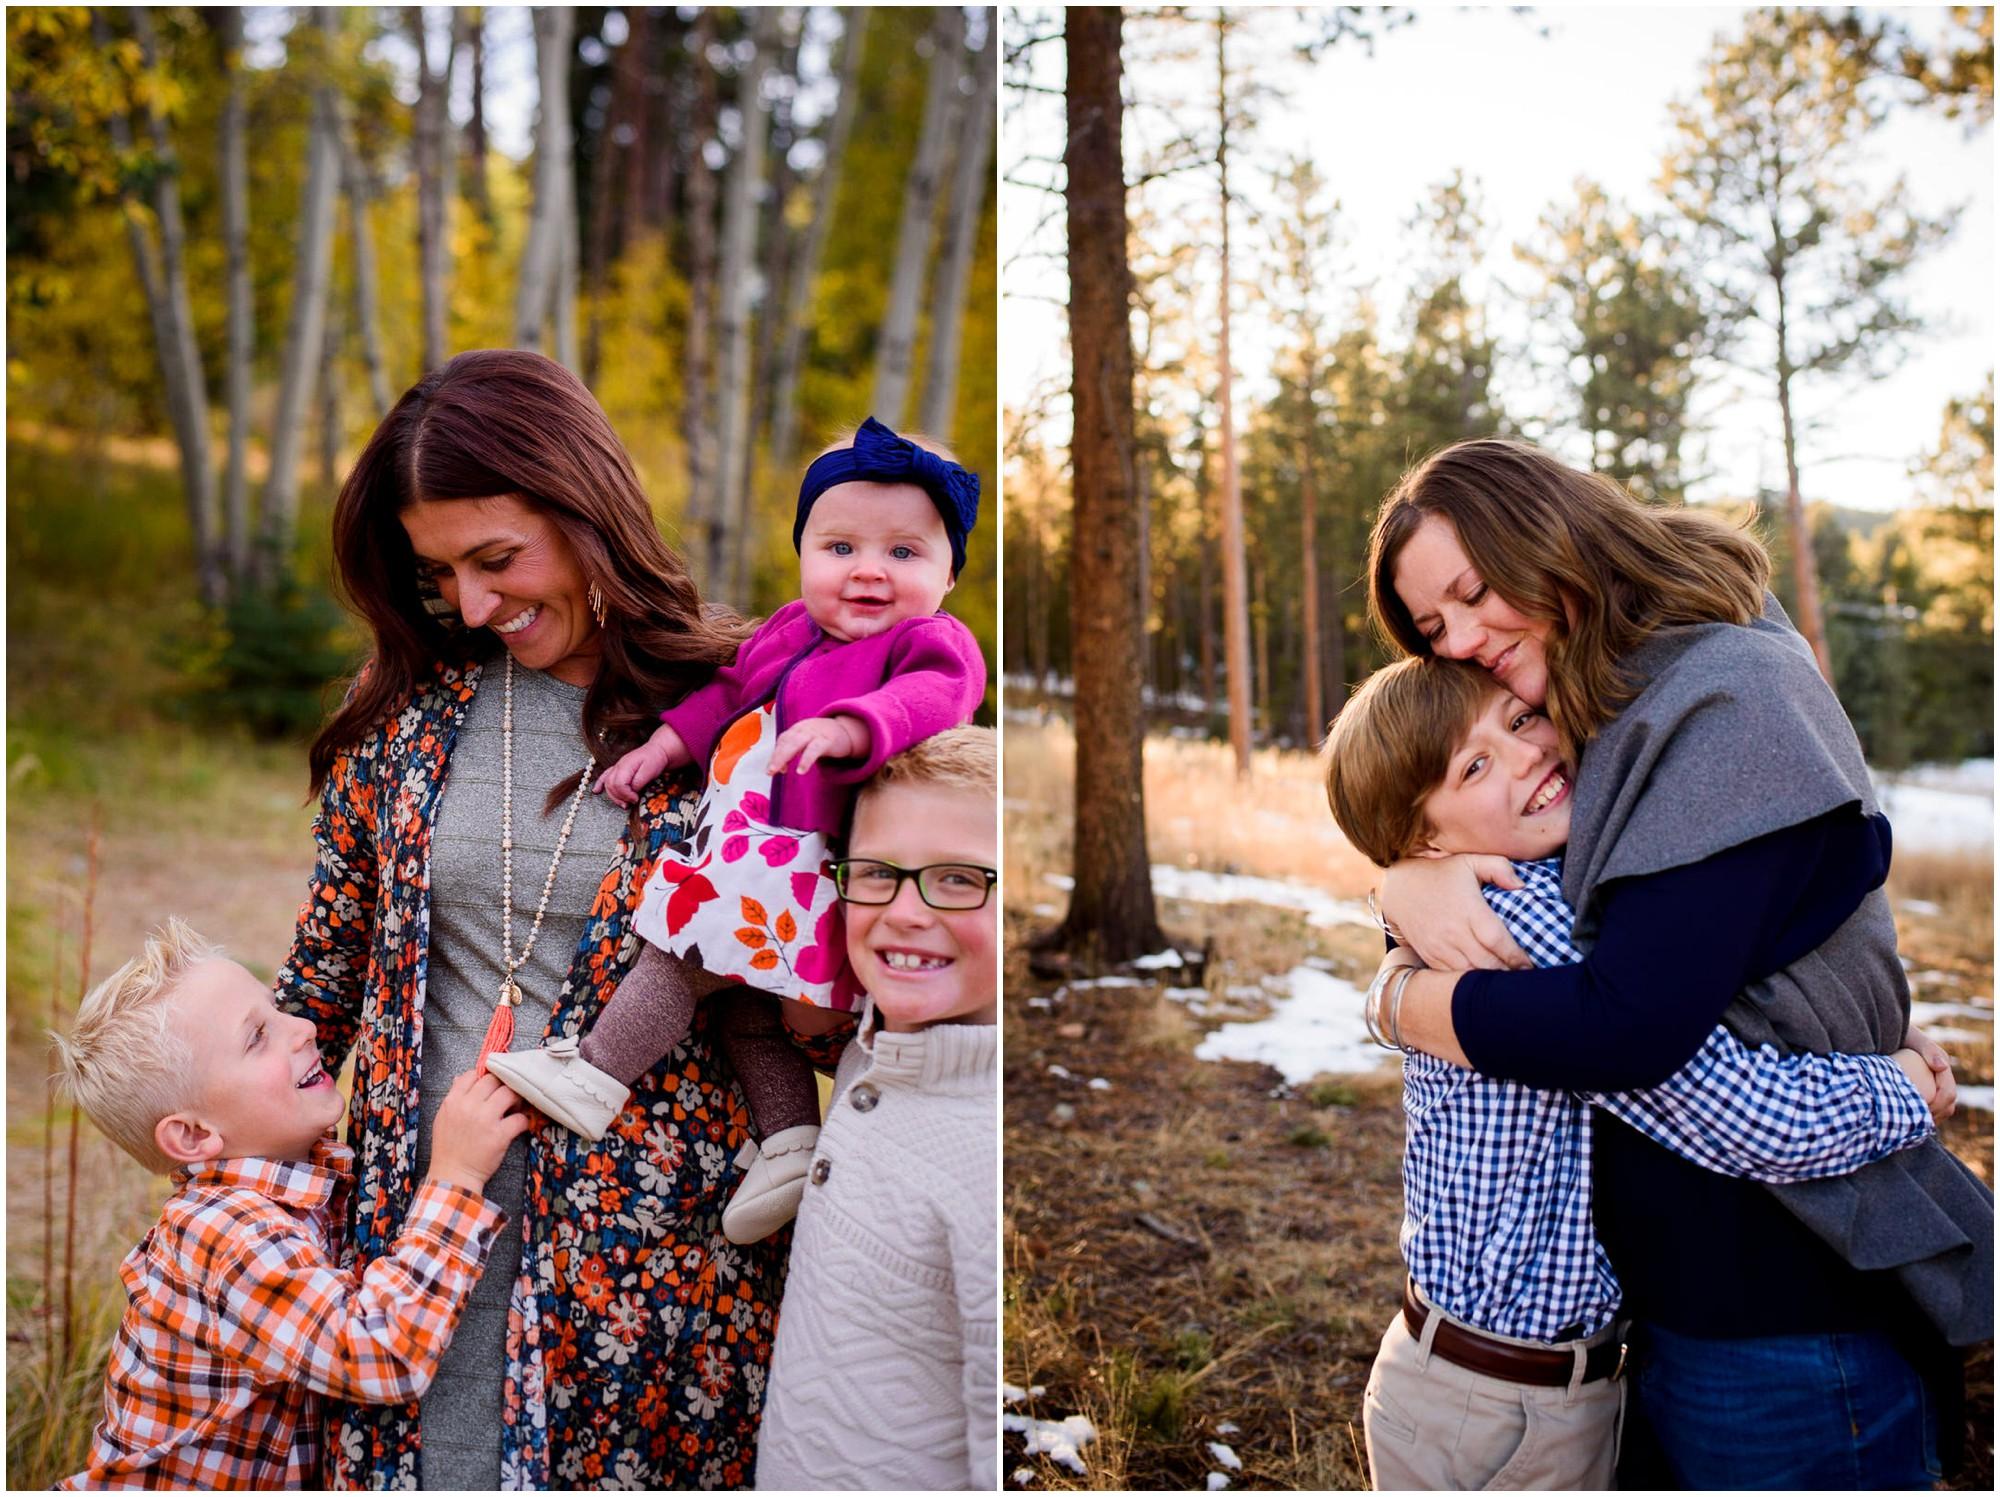 42-meyer-ranch-fall-family-photography-evans.jpg